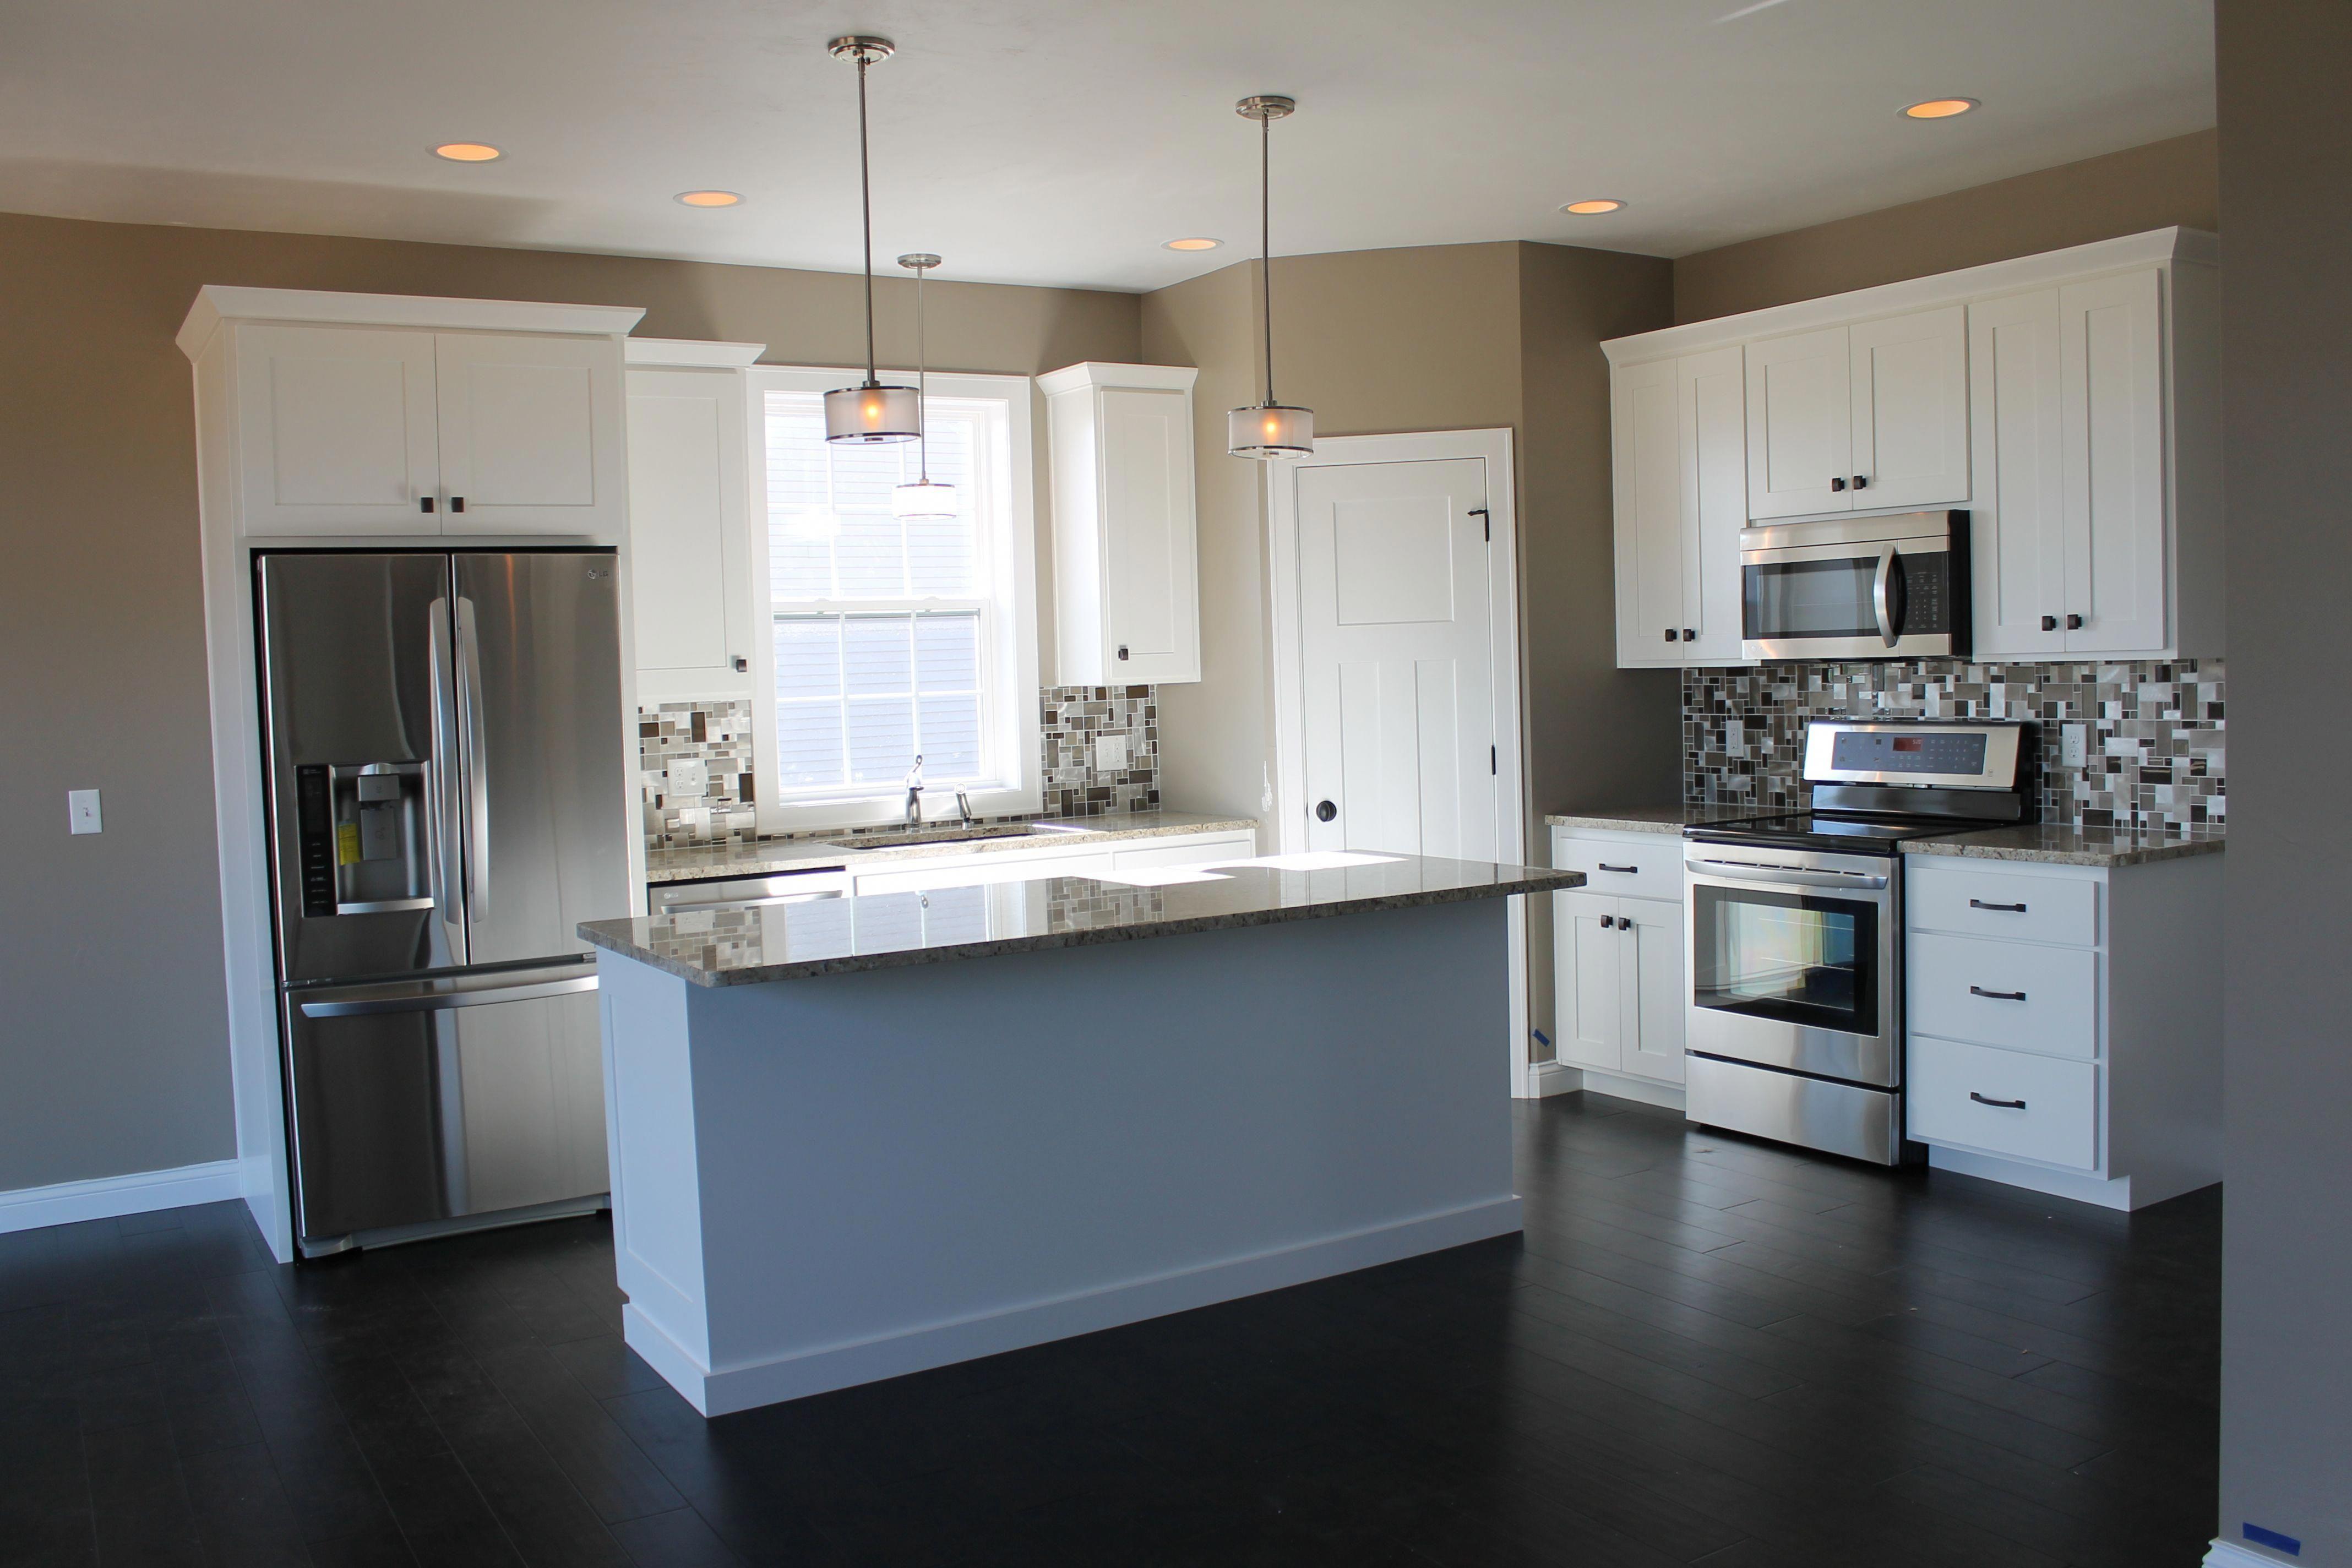 5322 White Kitchen With Large Center Island Kitchen Layout L Shaped Description Spacious Corner Small Kitchen Layouts Kitchen Designs Layout Kitchen Layout